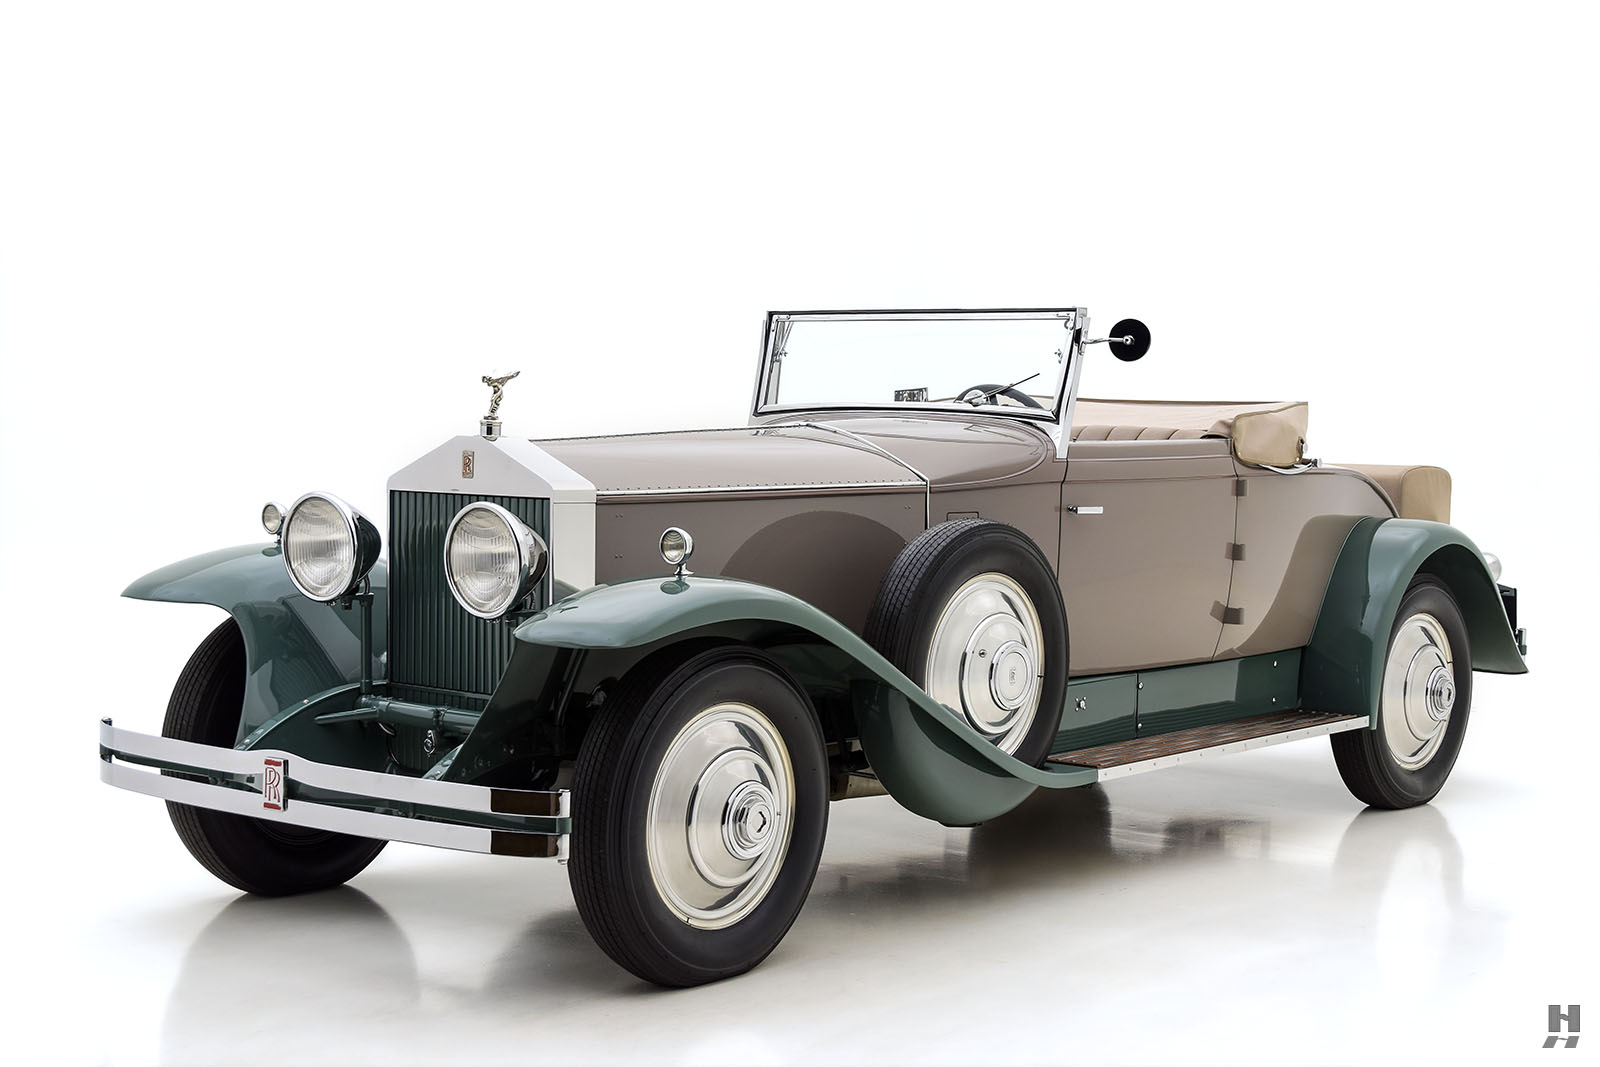 1931 rolls royce phantom 1 regent convertible coupe for sale hyman 1931 rolls royce phantom 1 regent